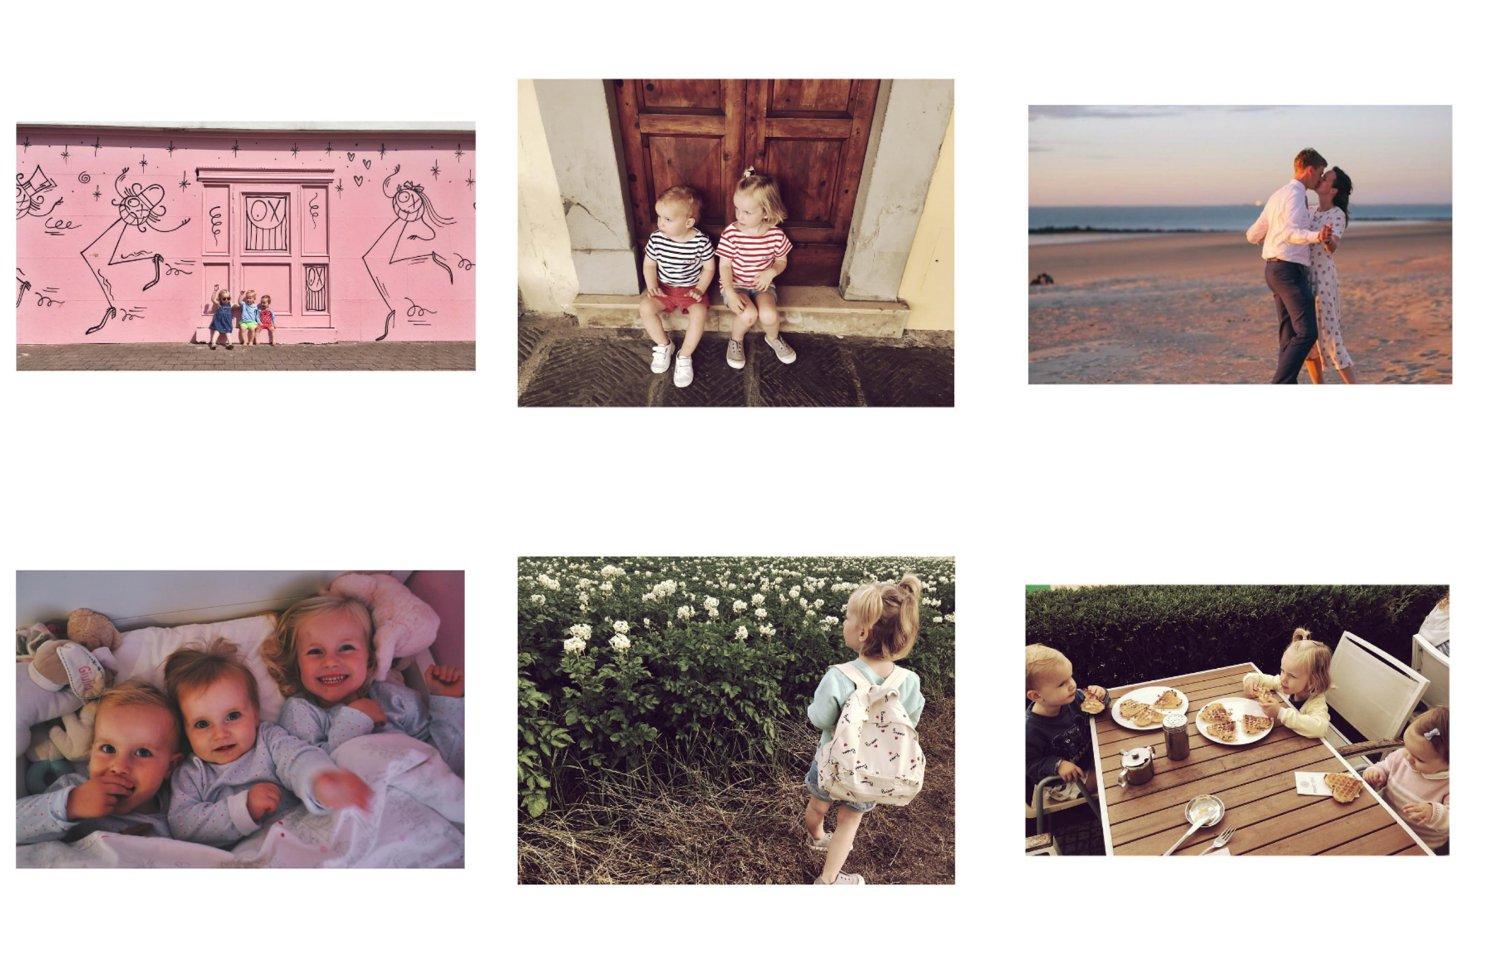 Instagram - vicoloves